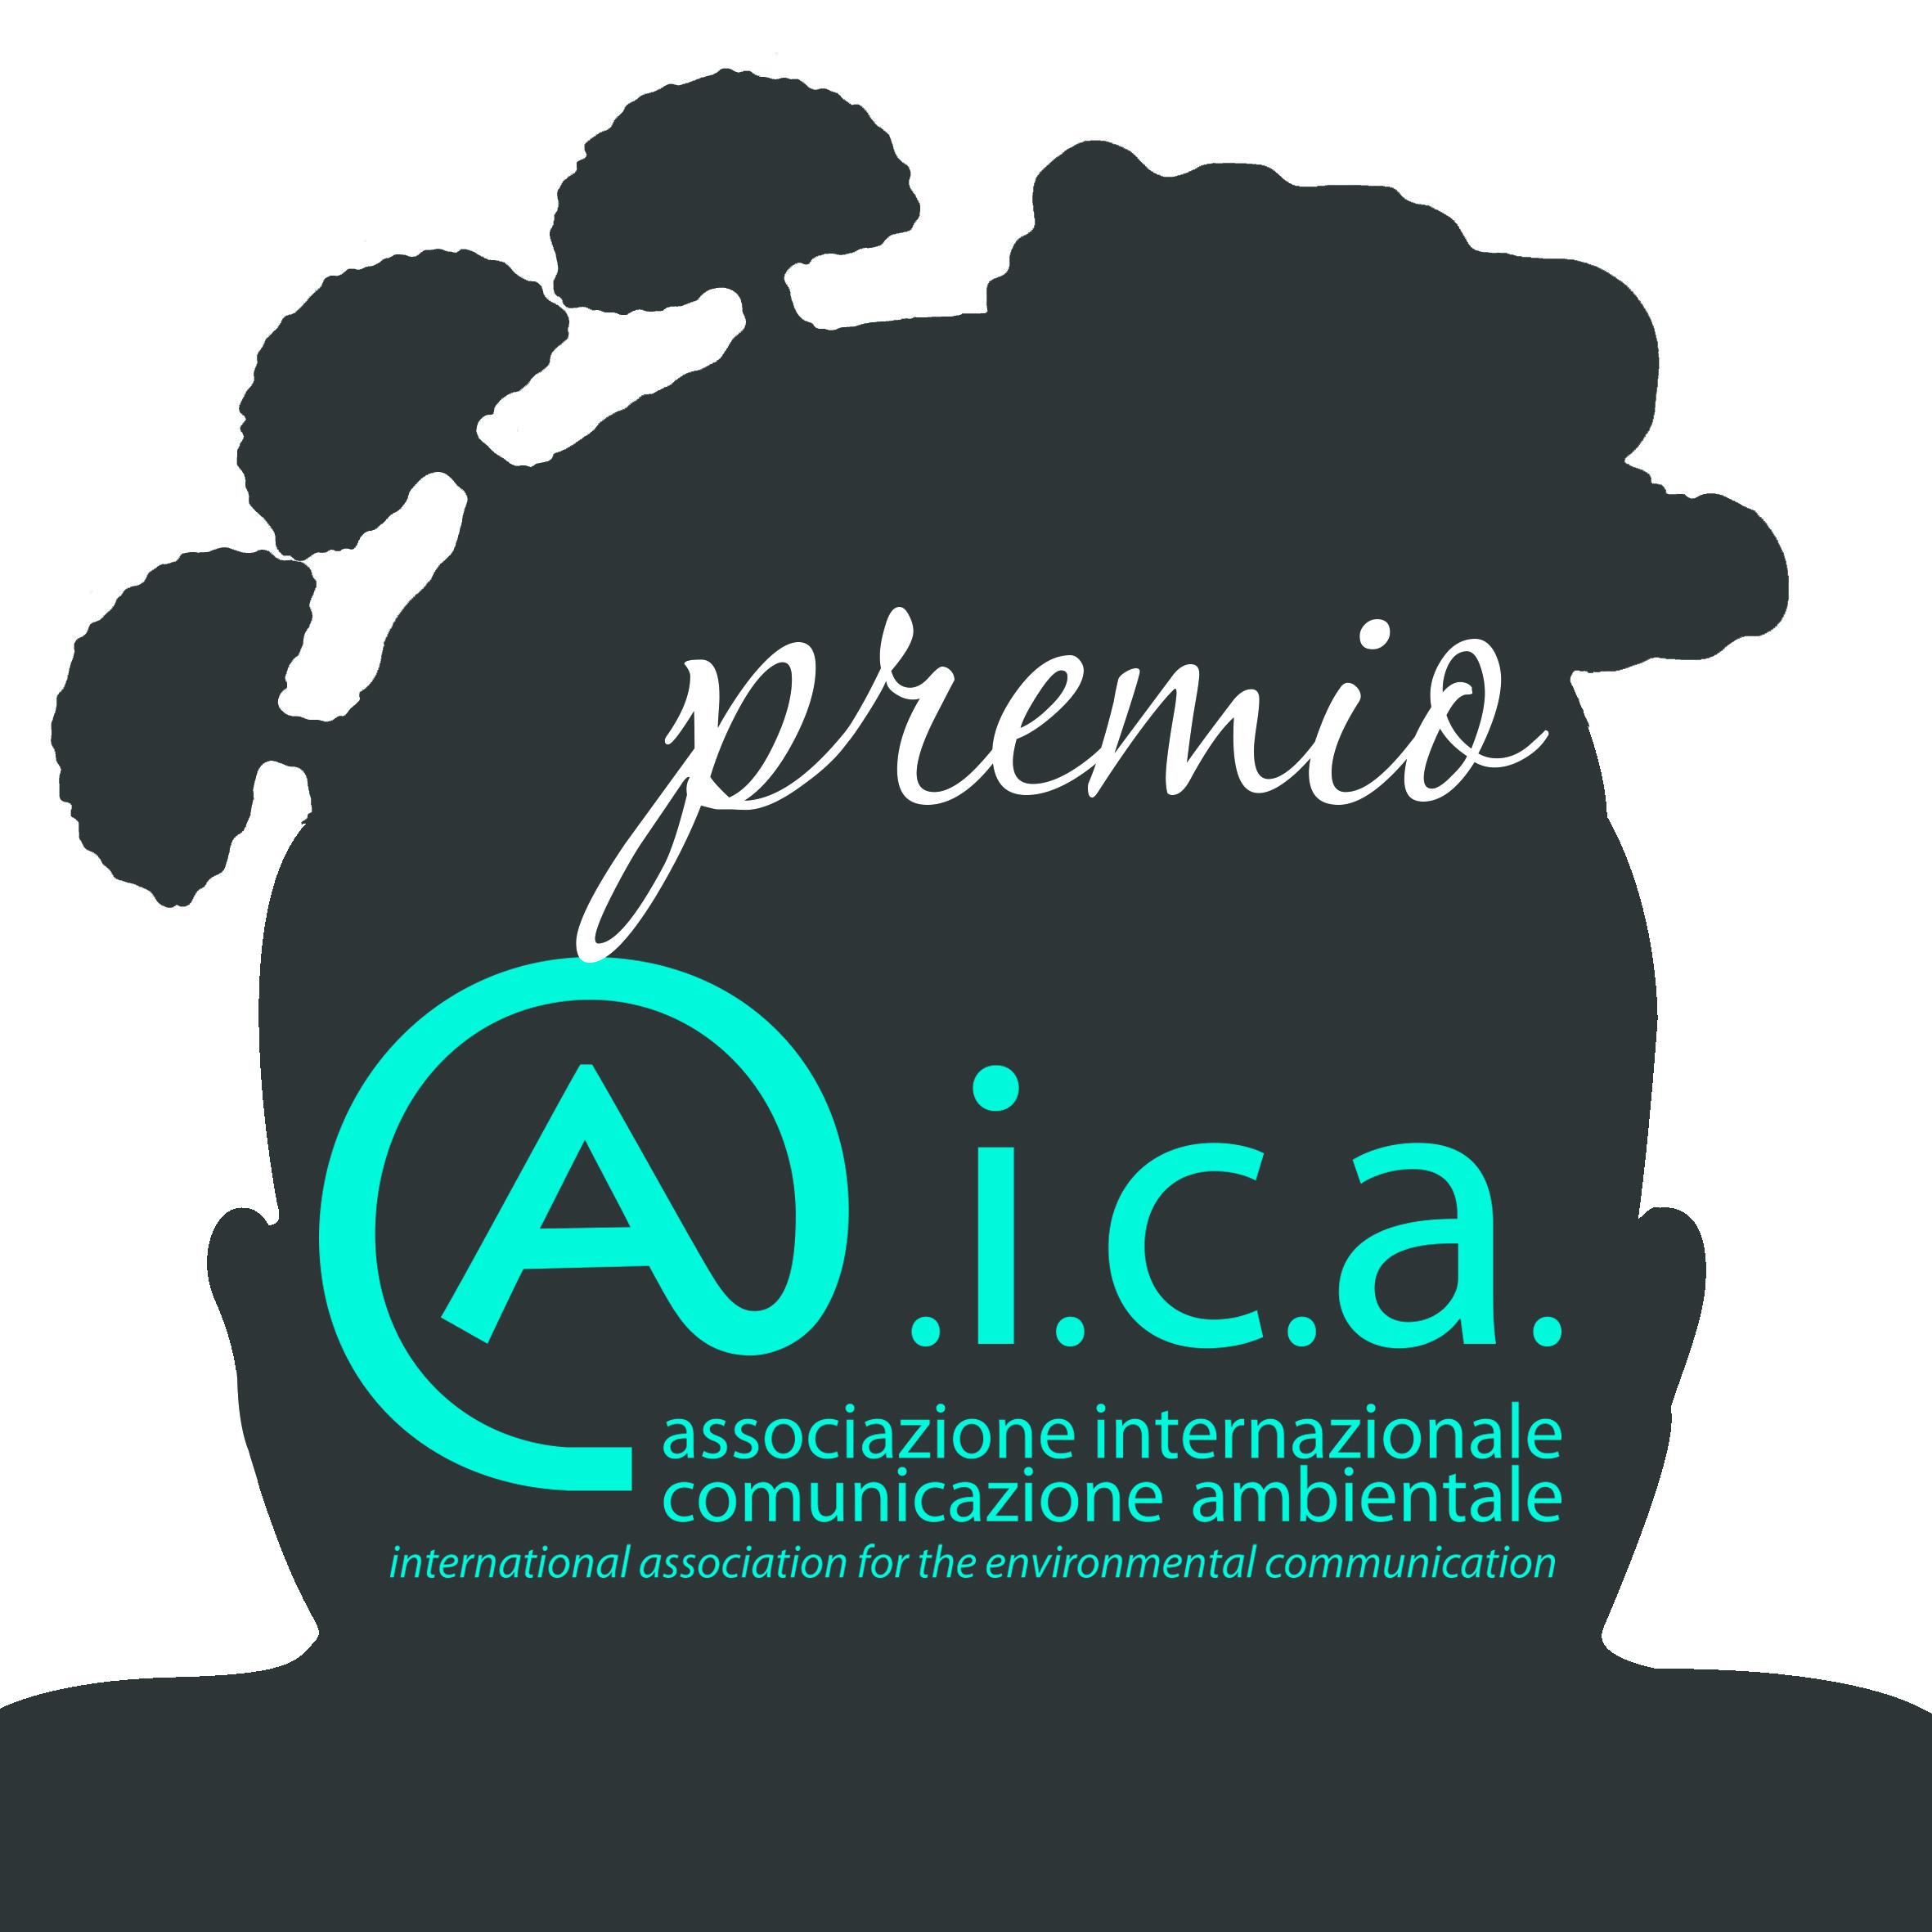 logo-premio-aica2-no-data